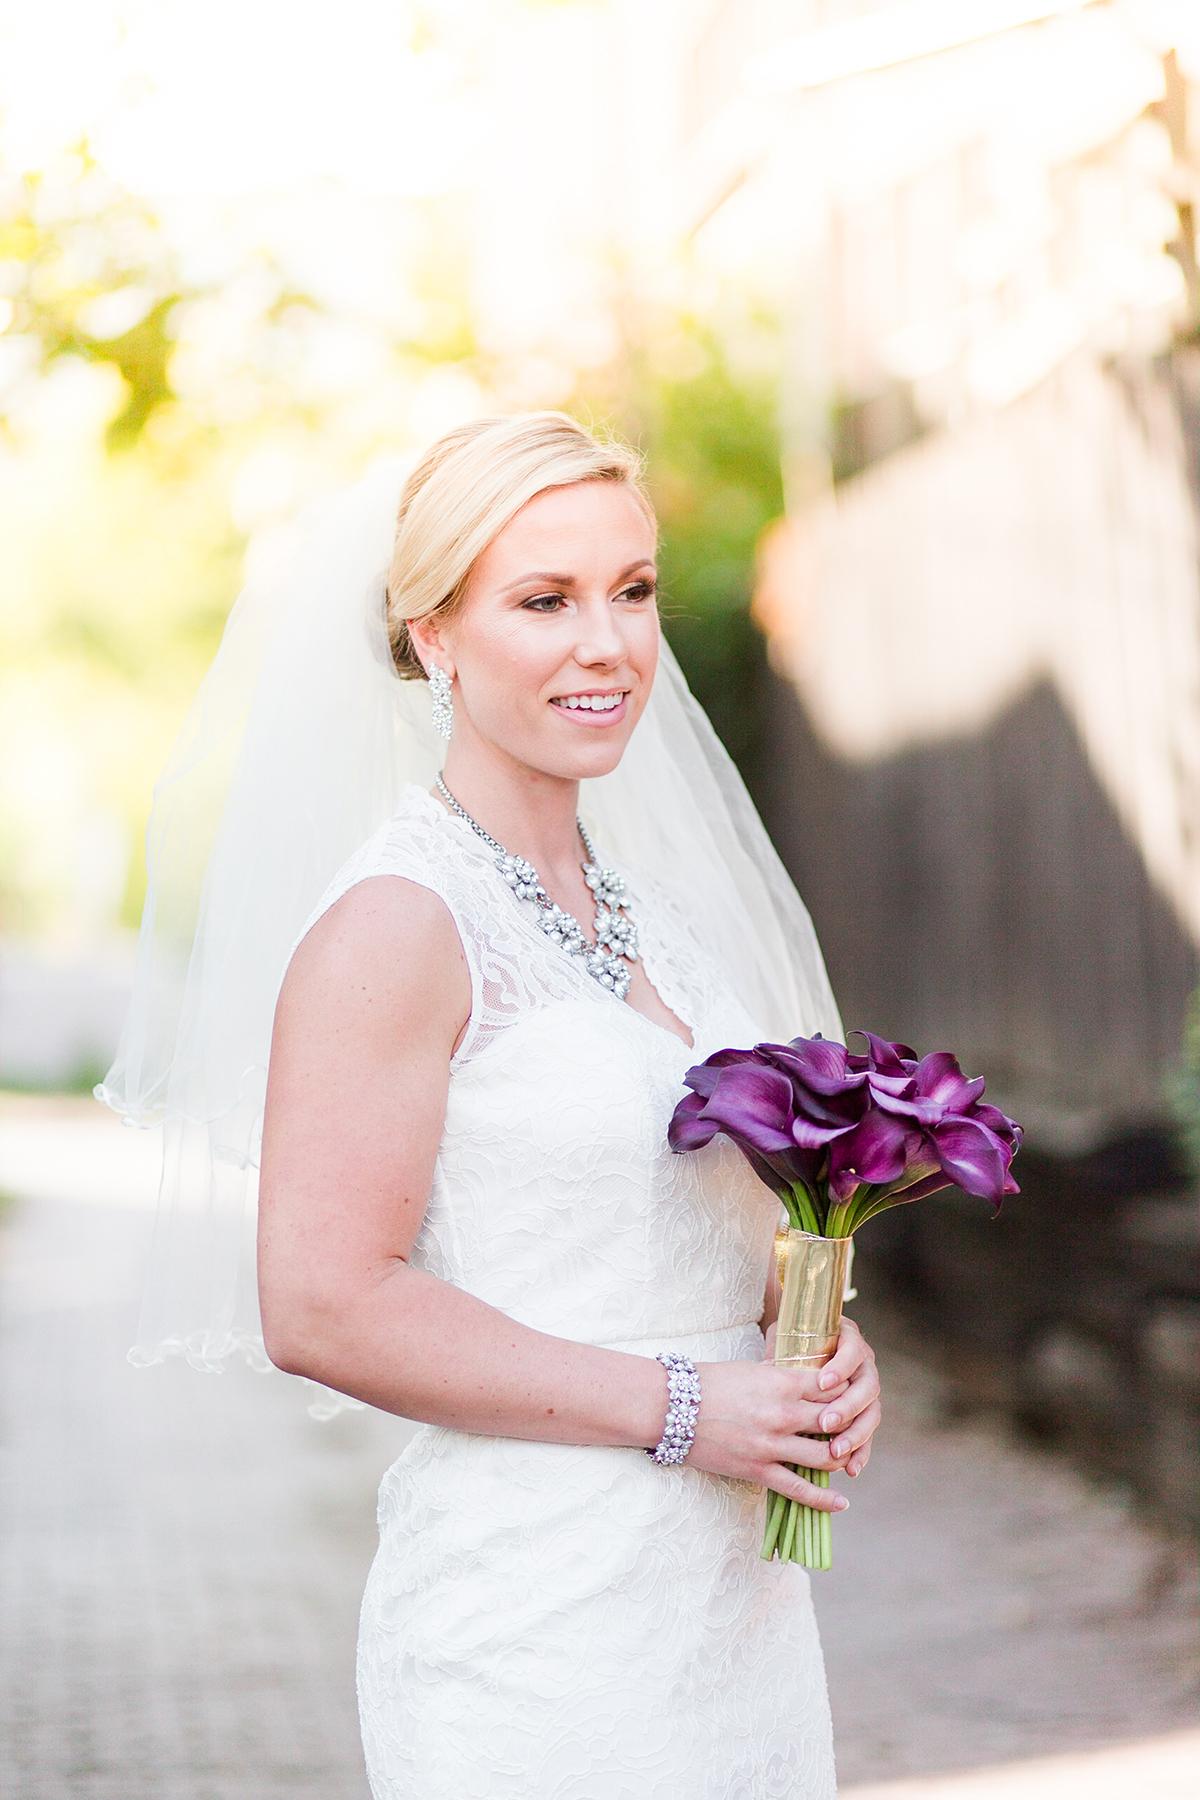 Intimate-Military-Elopement-bride.jpg